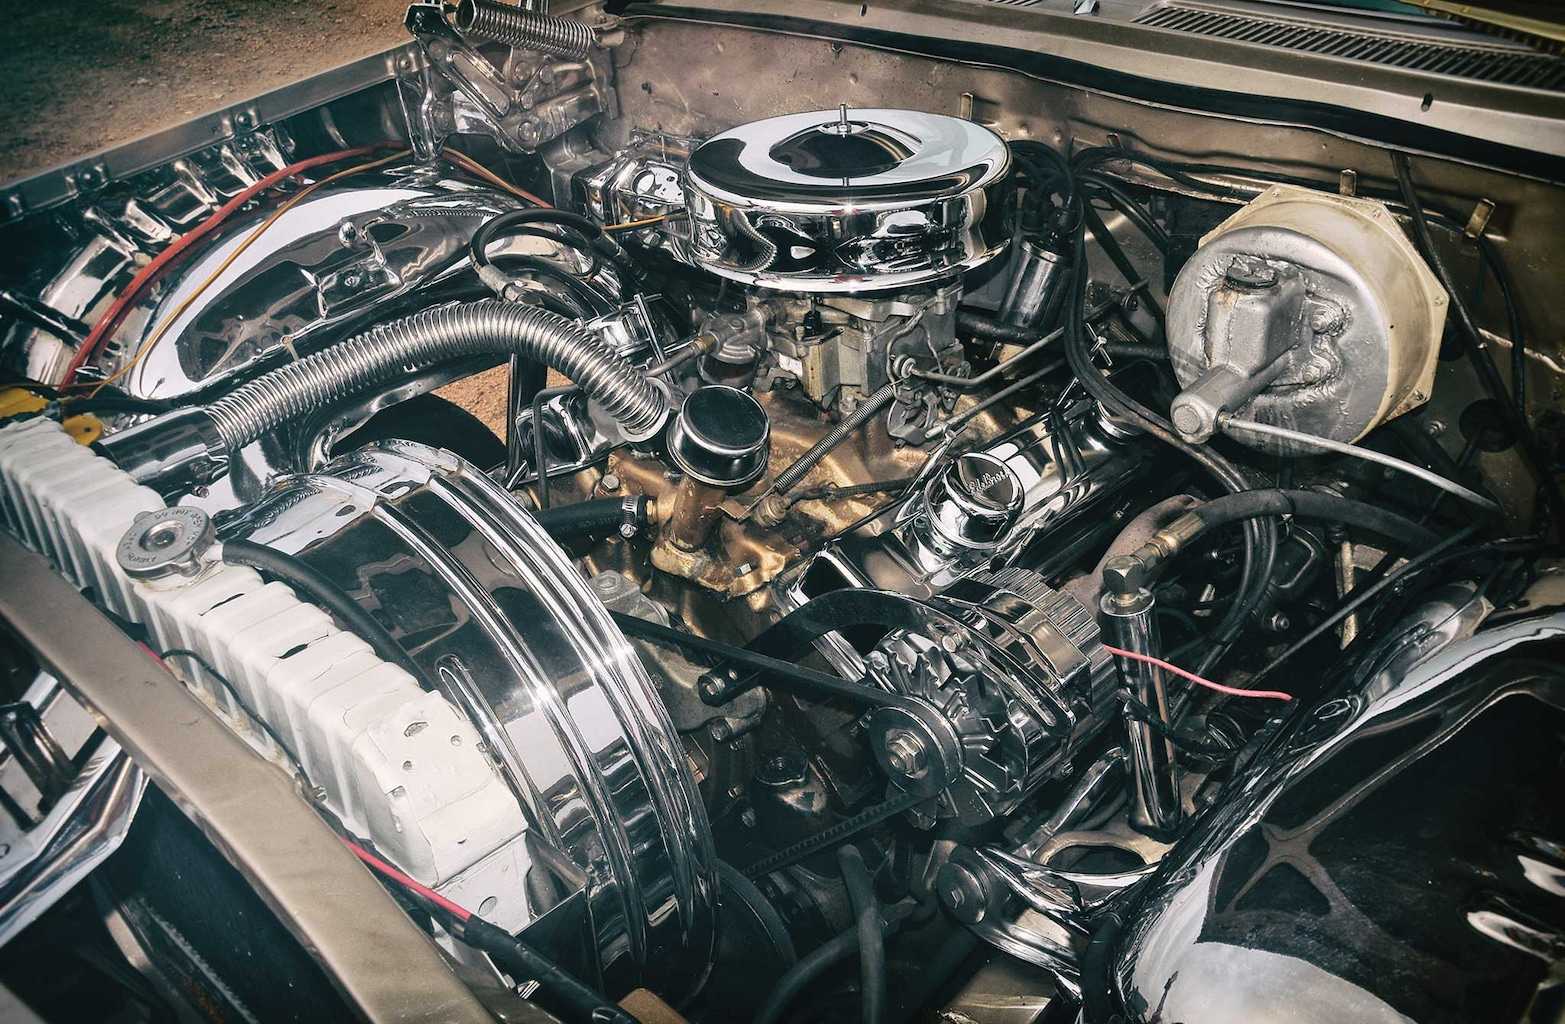 1961 chevrolet impala factory 283 004